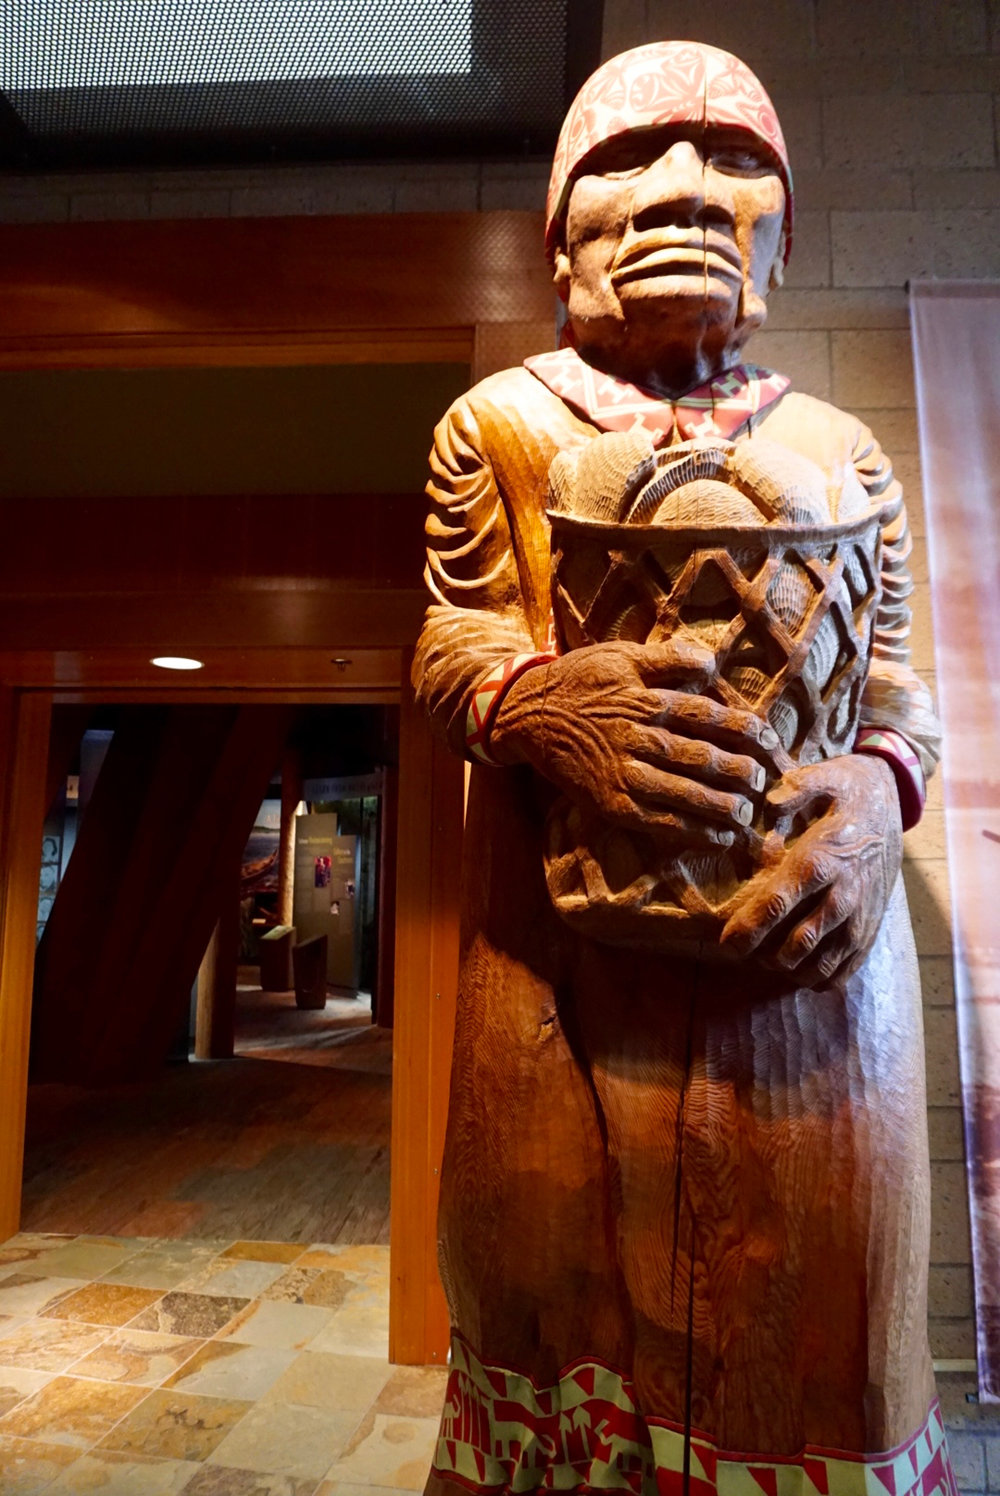 In Canoe Hall, entering the main exhibit